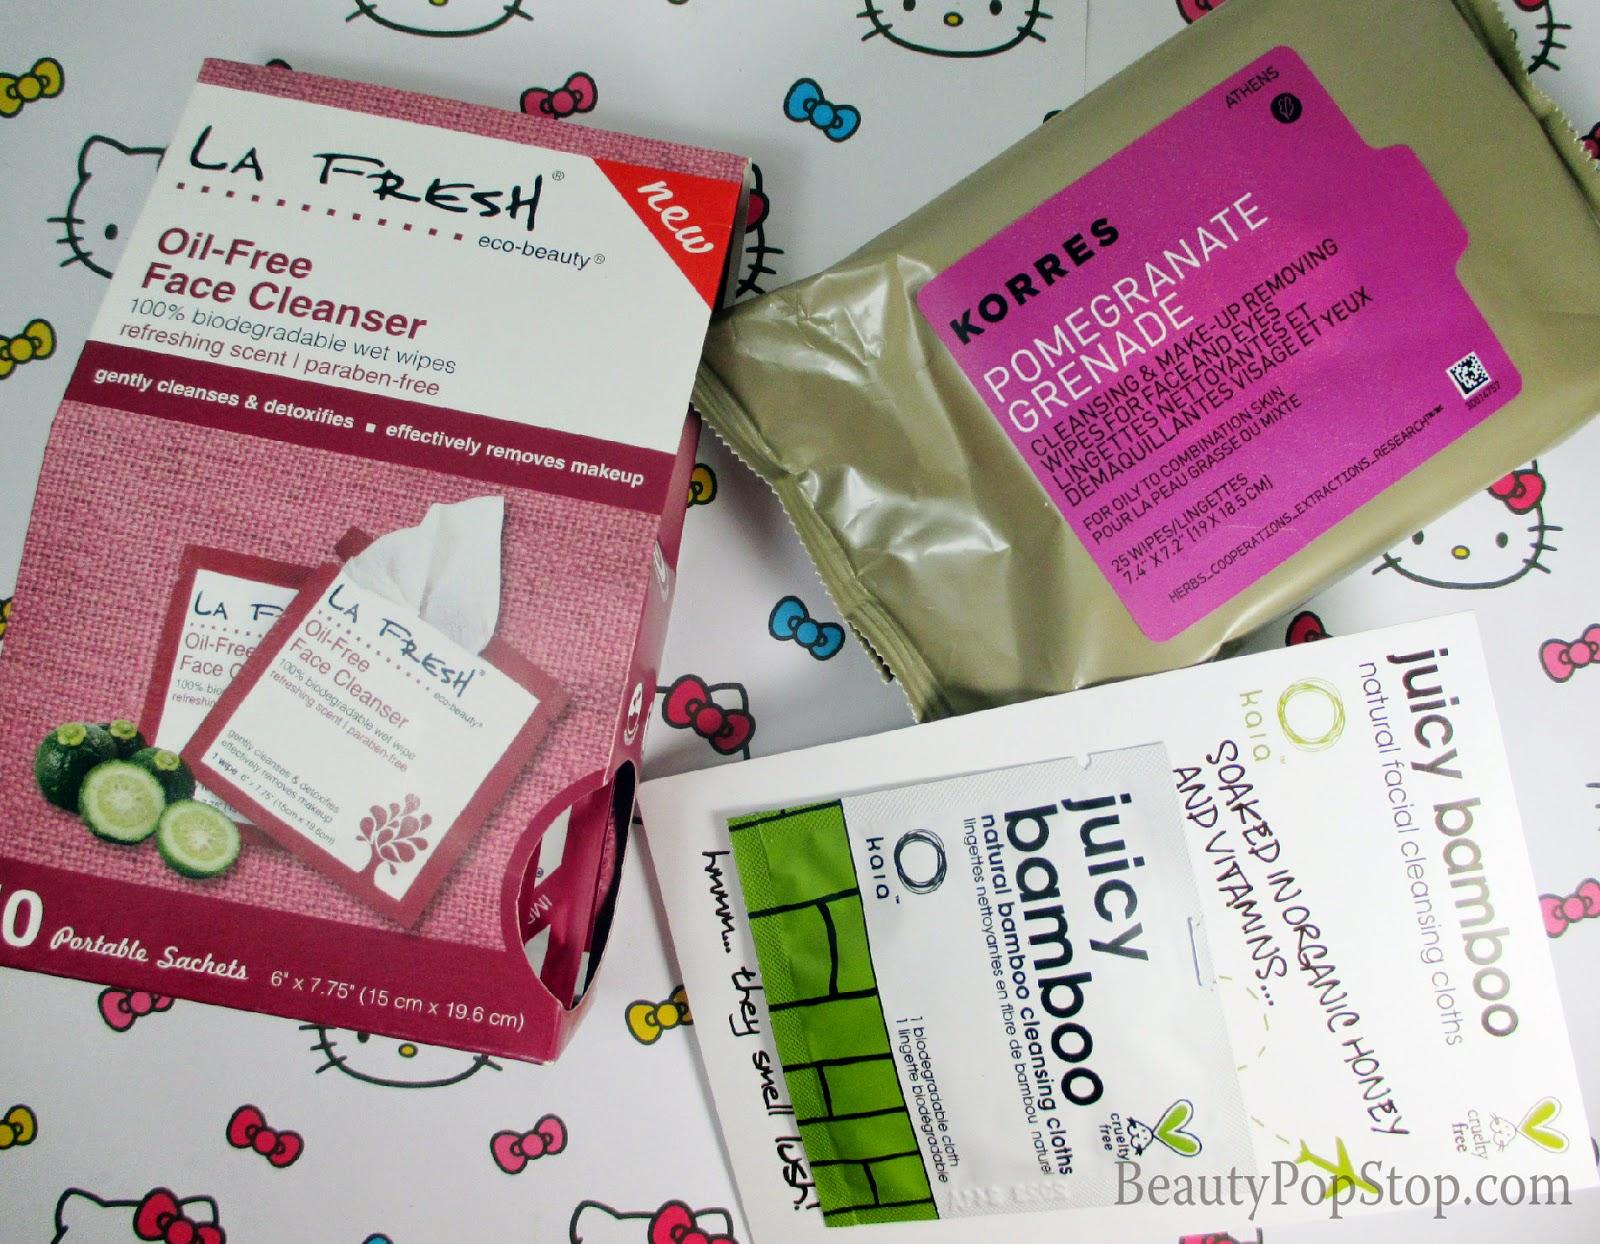 top face cleansing cloths - korres, LA fresh, kaia natural